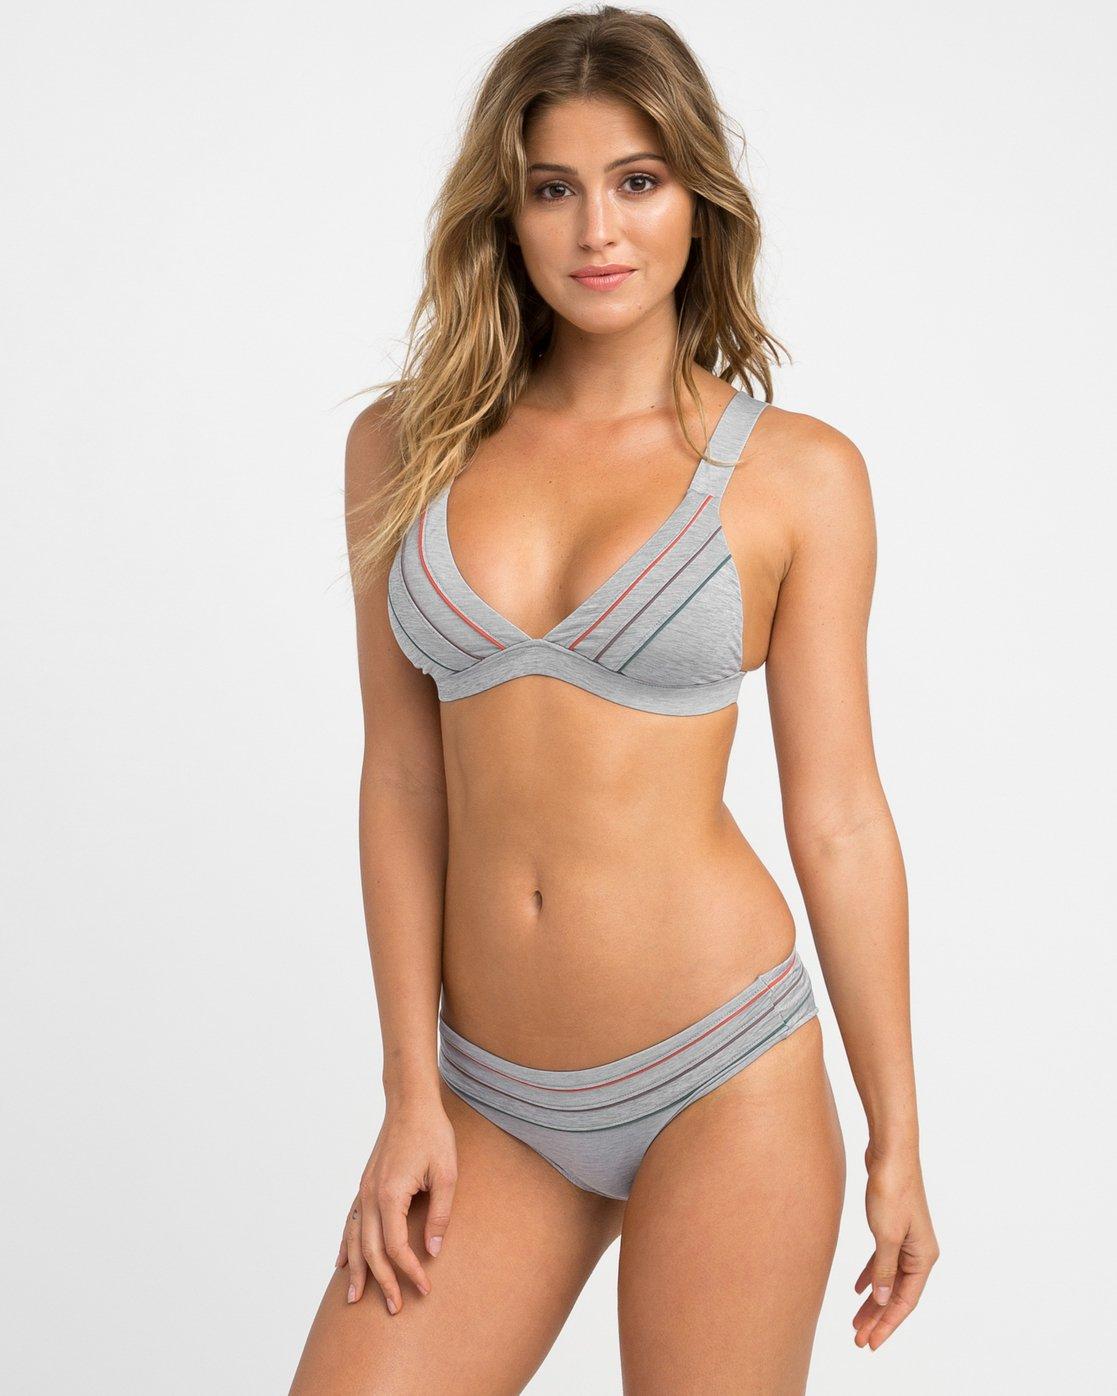 f3e8d1fe8aa Pipeline Triangle Bikini Top